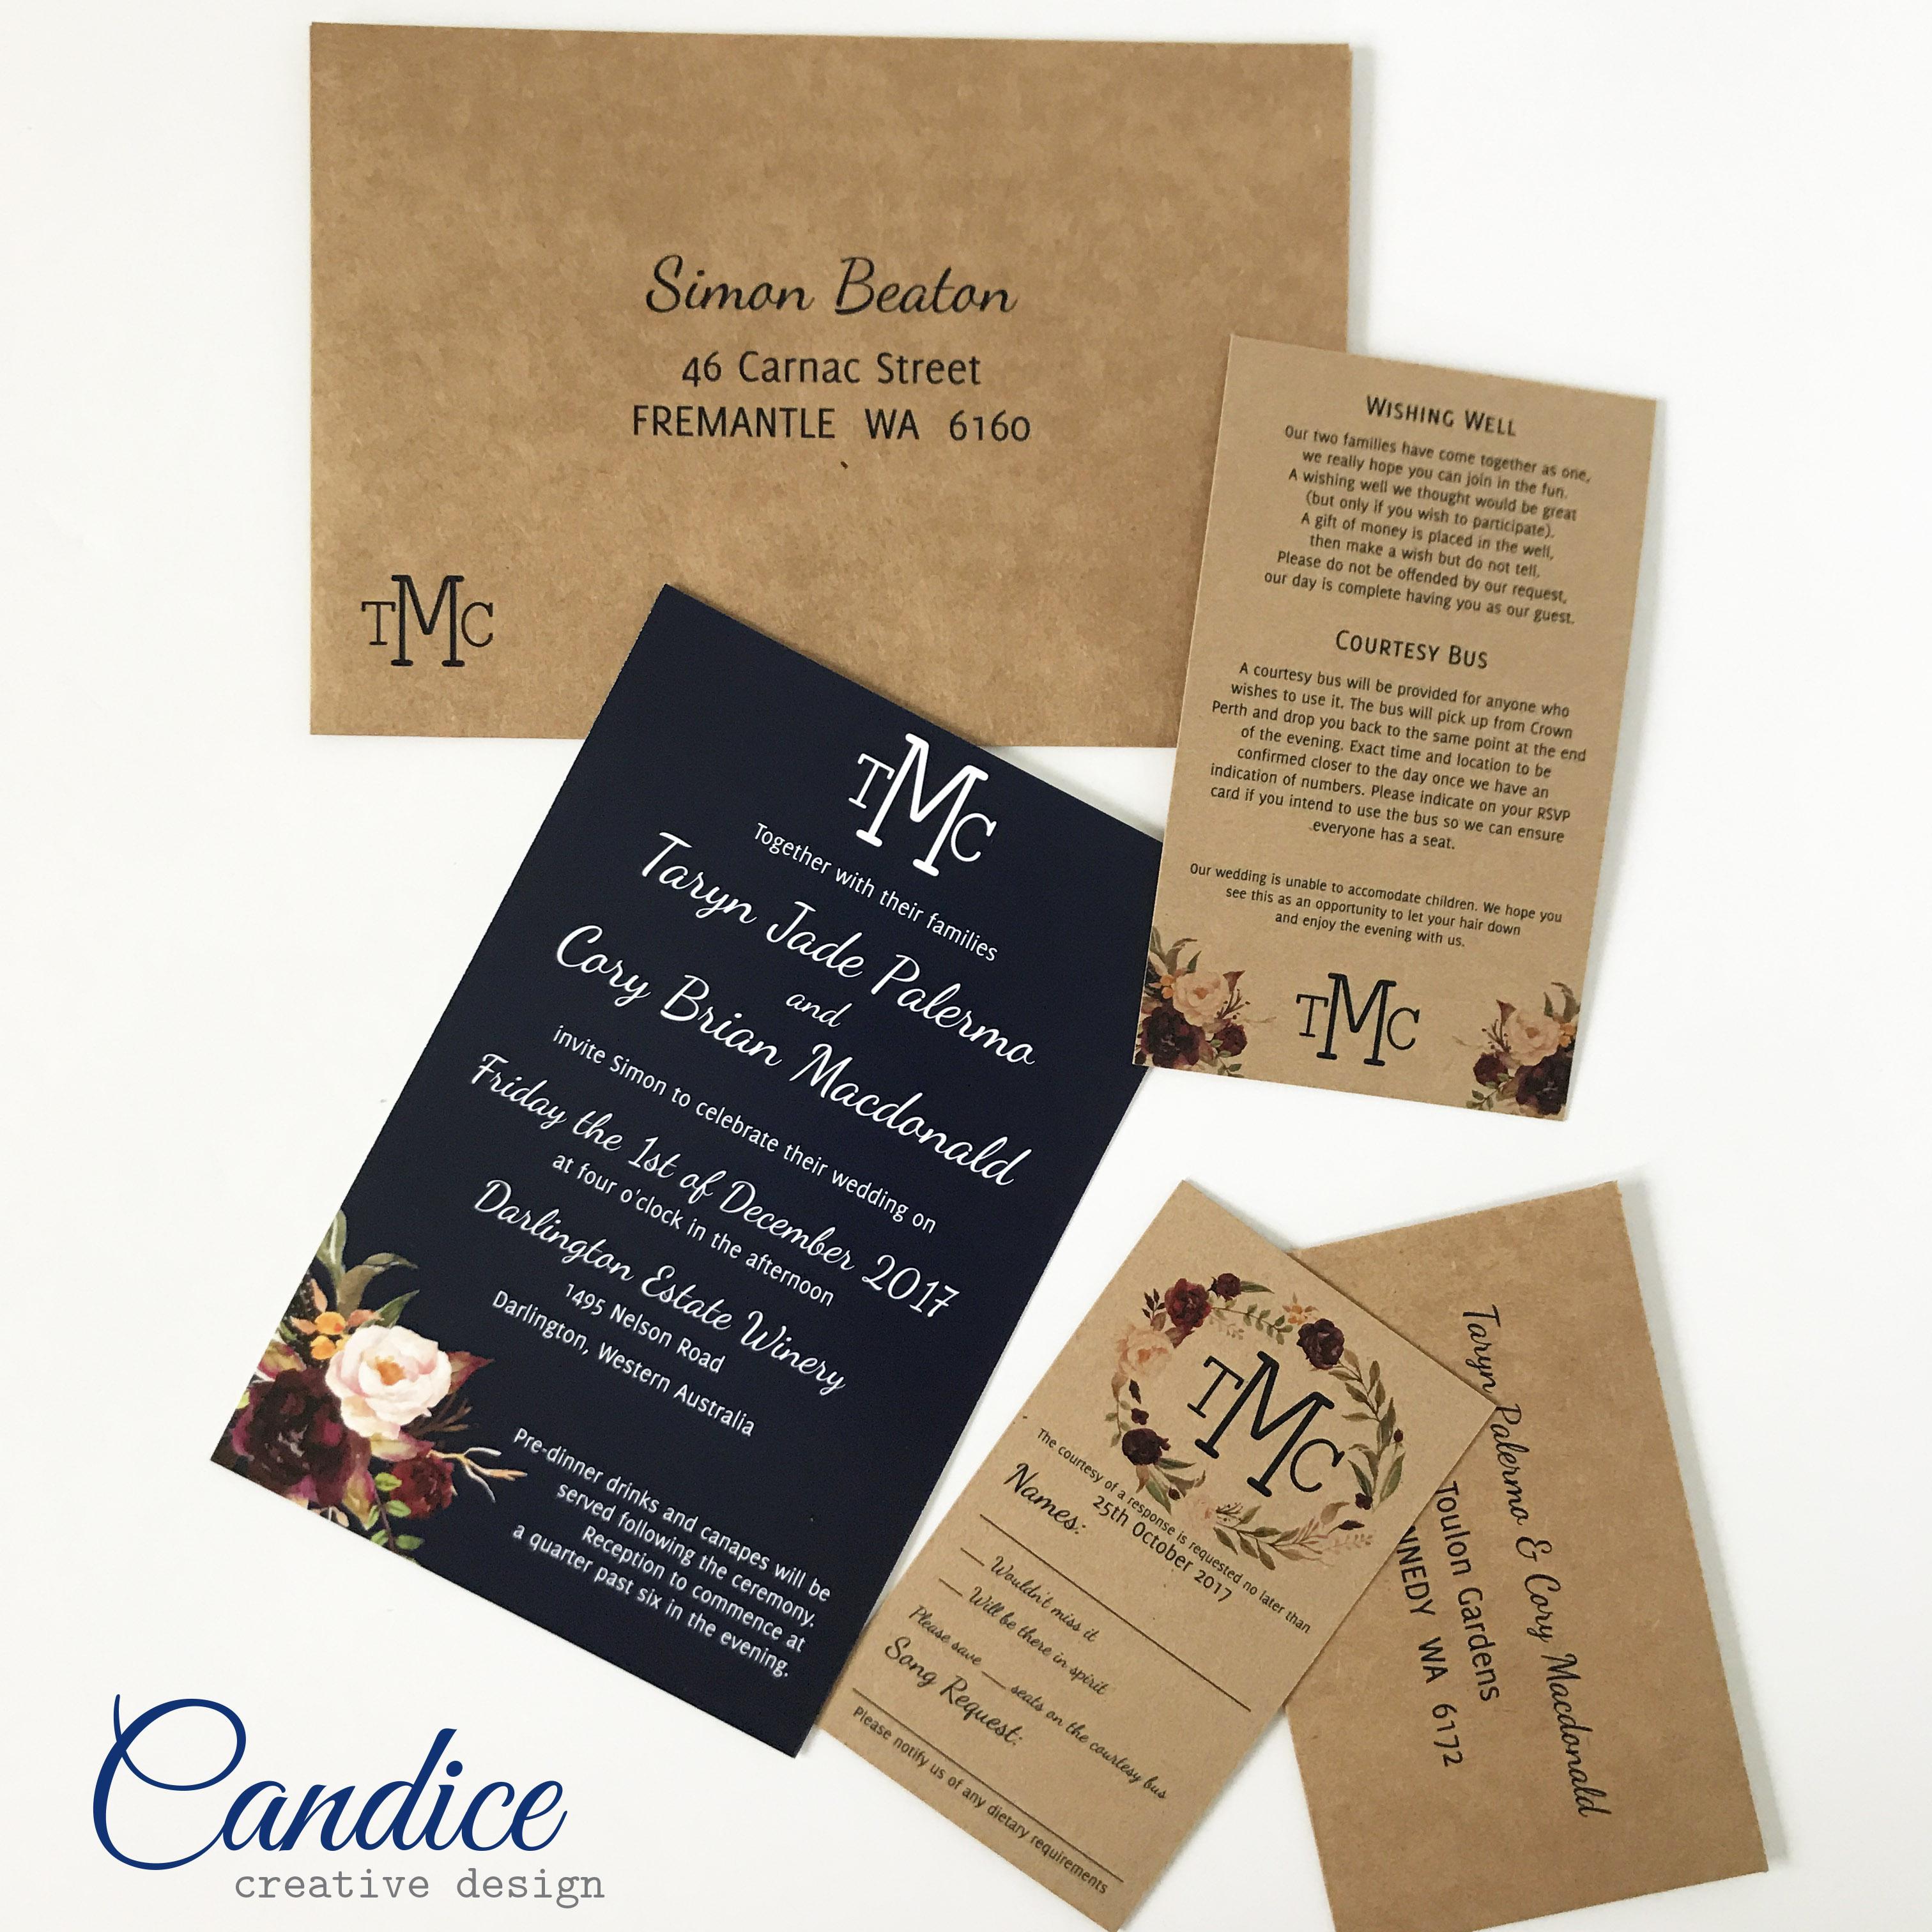 Candice creative design wedding invitations in perth western candice creative design wedding invitations in perth western australia bridestory stopboris Choice Image